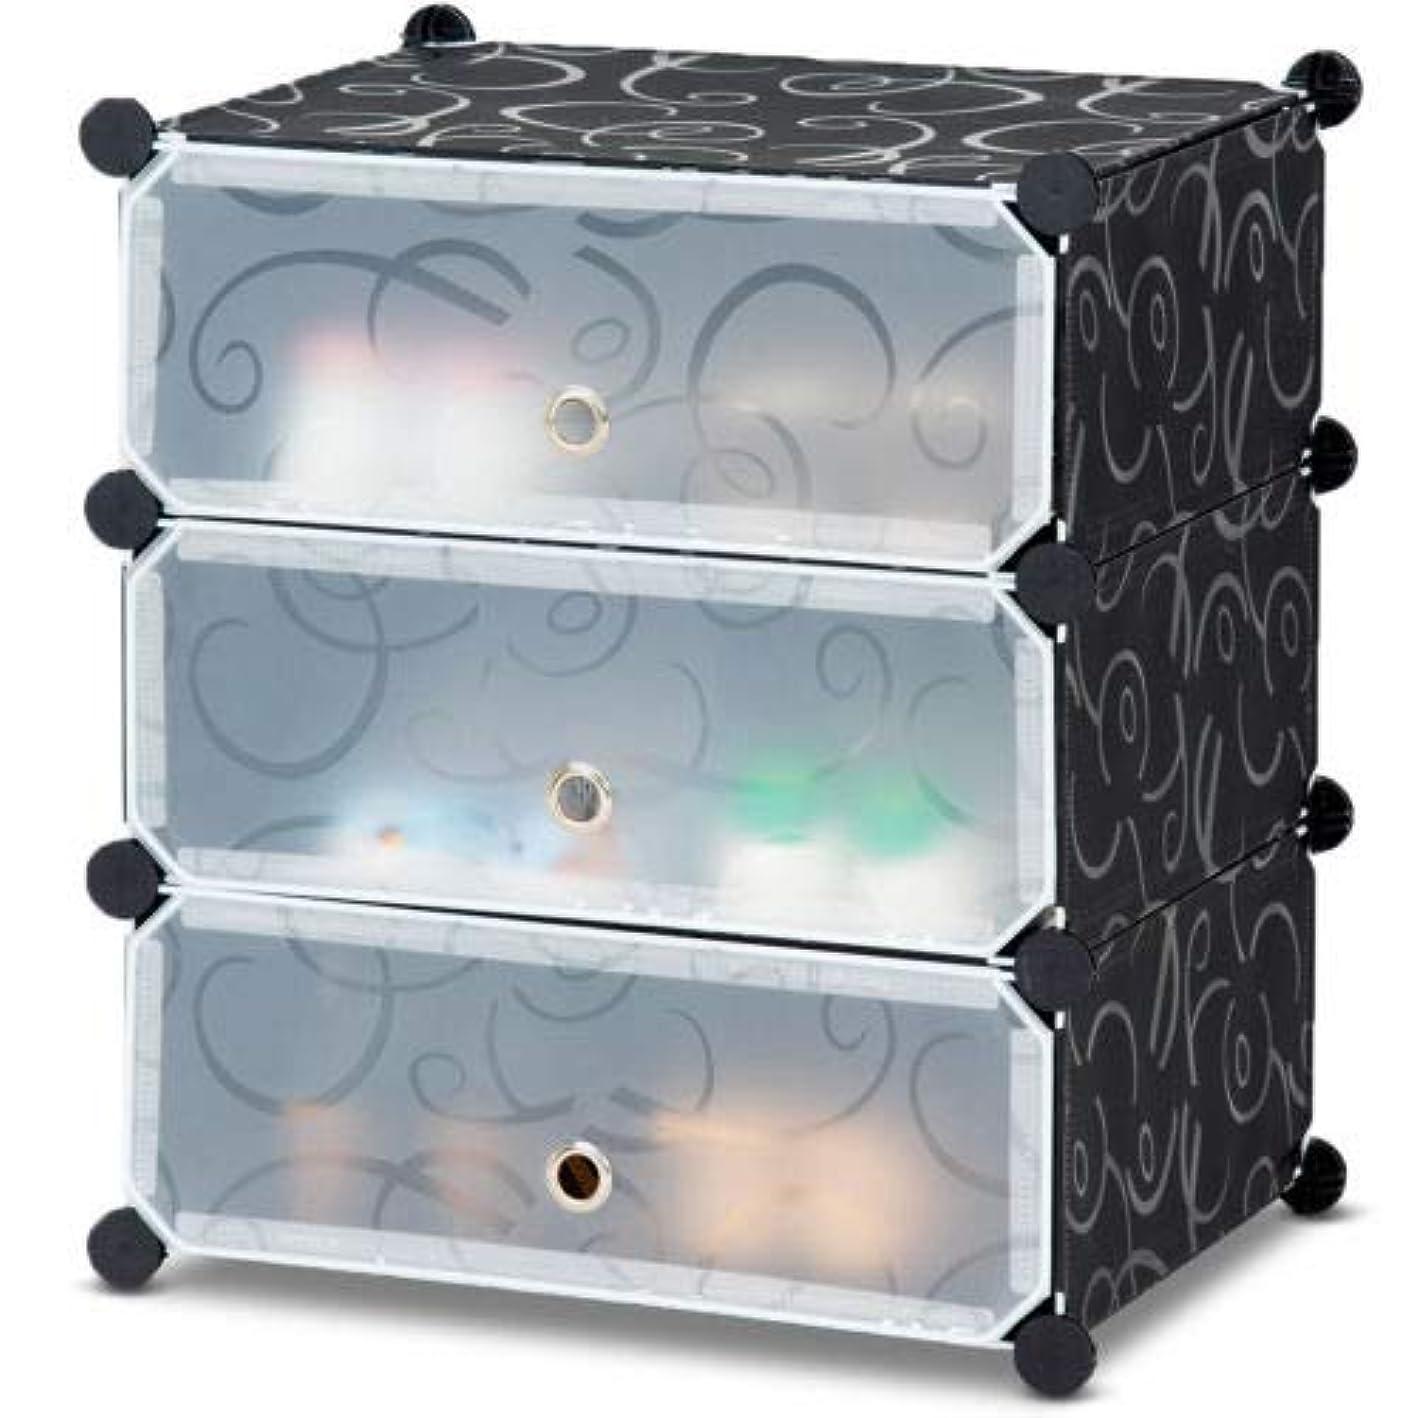 HTH STORE Portable Shoe Rack   Storage Cabinet 6 Pair Space  Saving Organizer   Cube Shelf   Modern Drawer   Cube Furniture